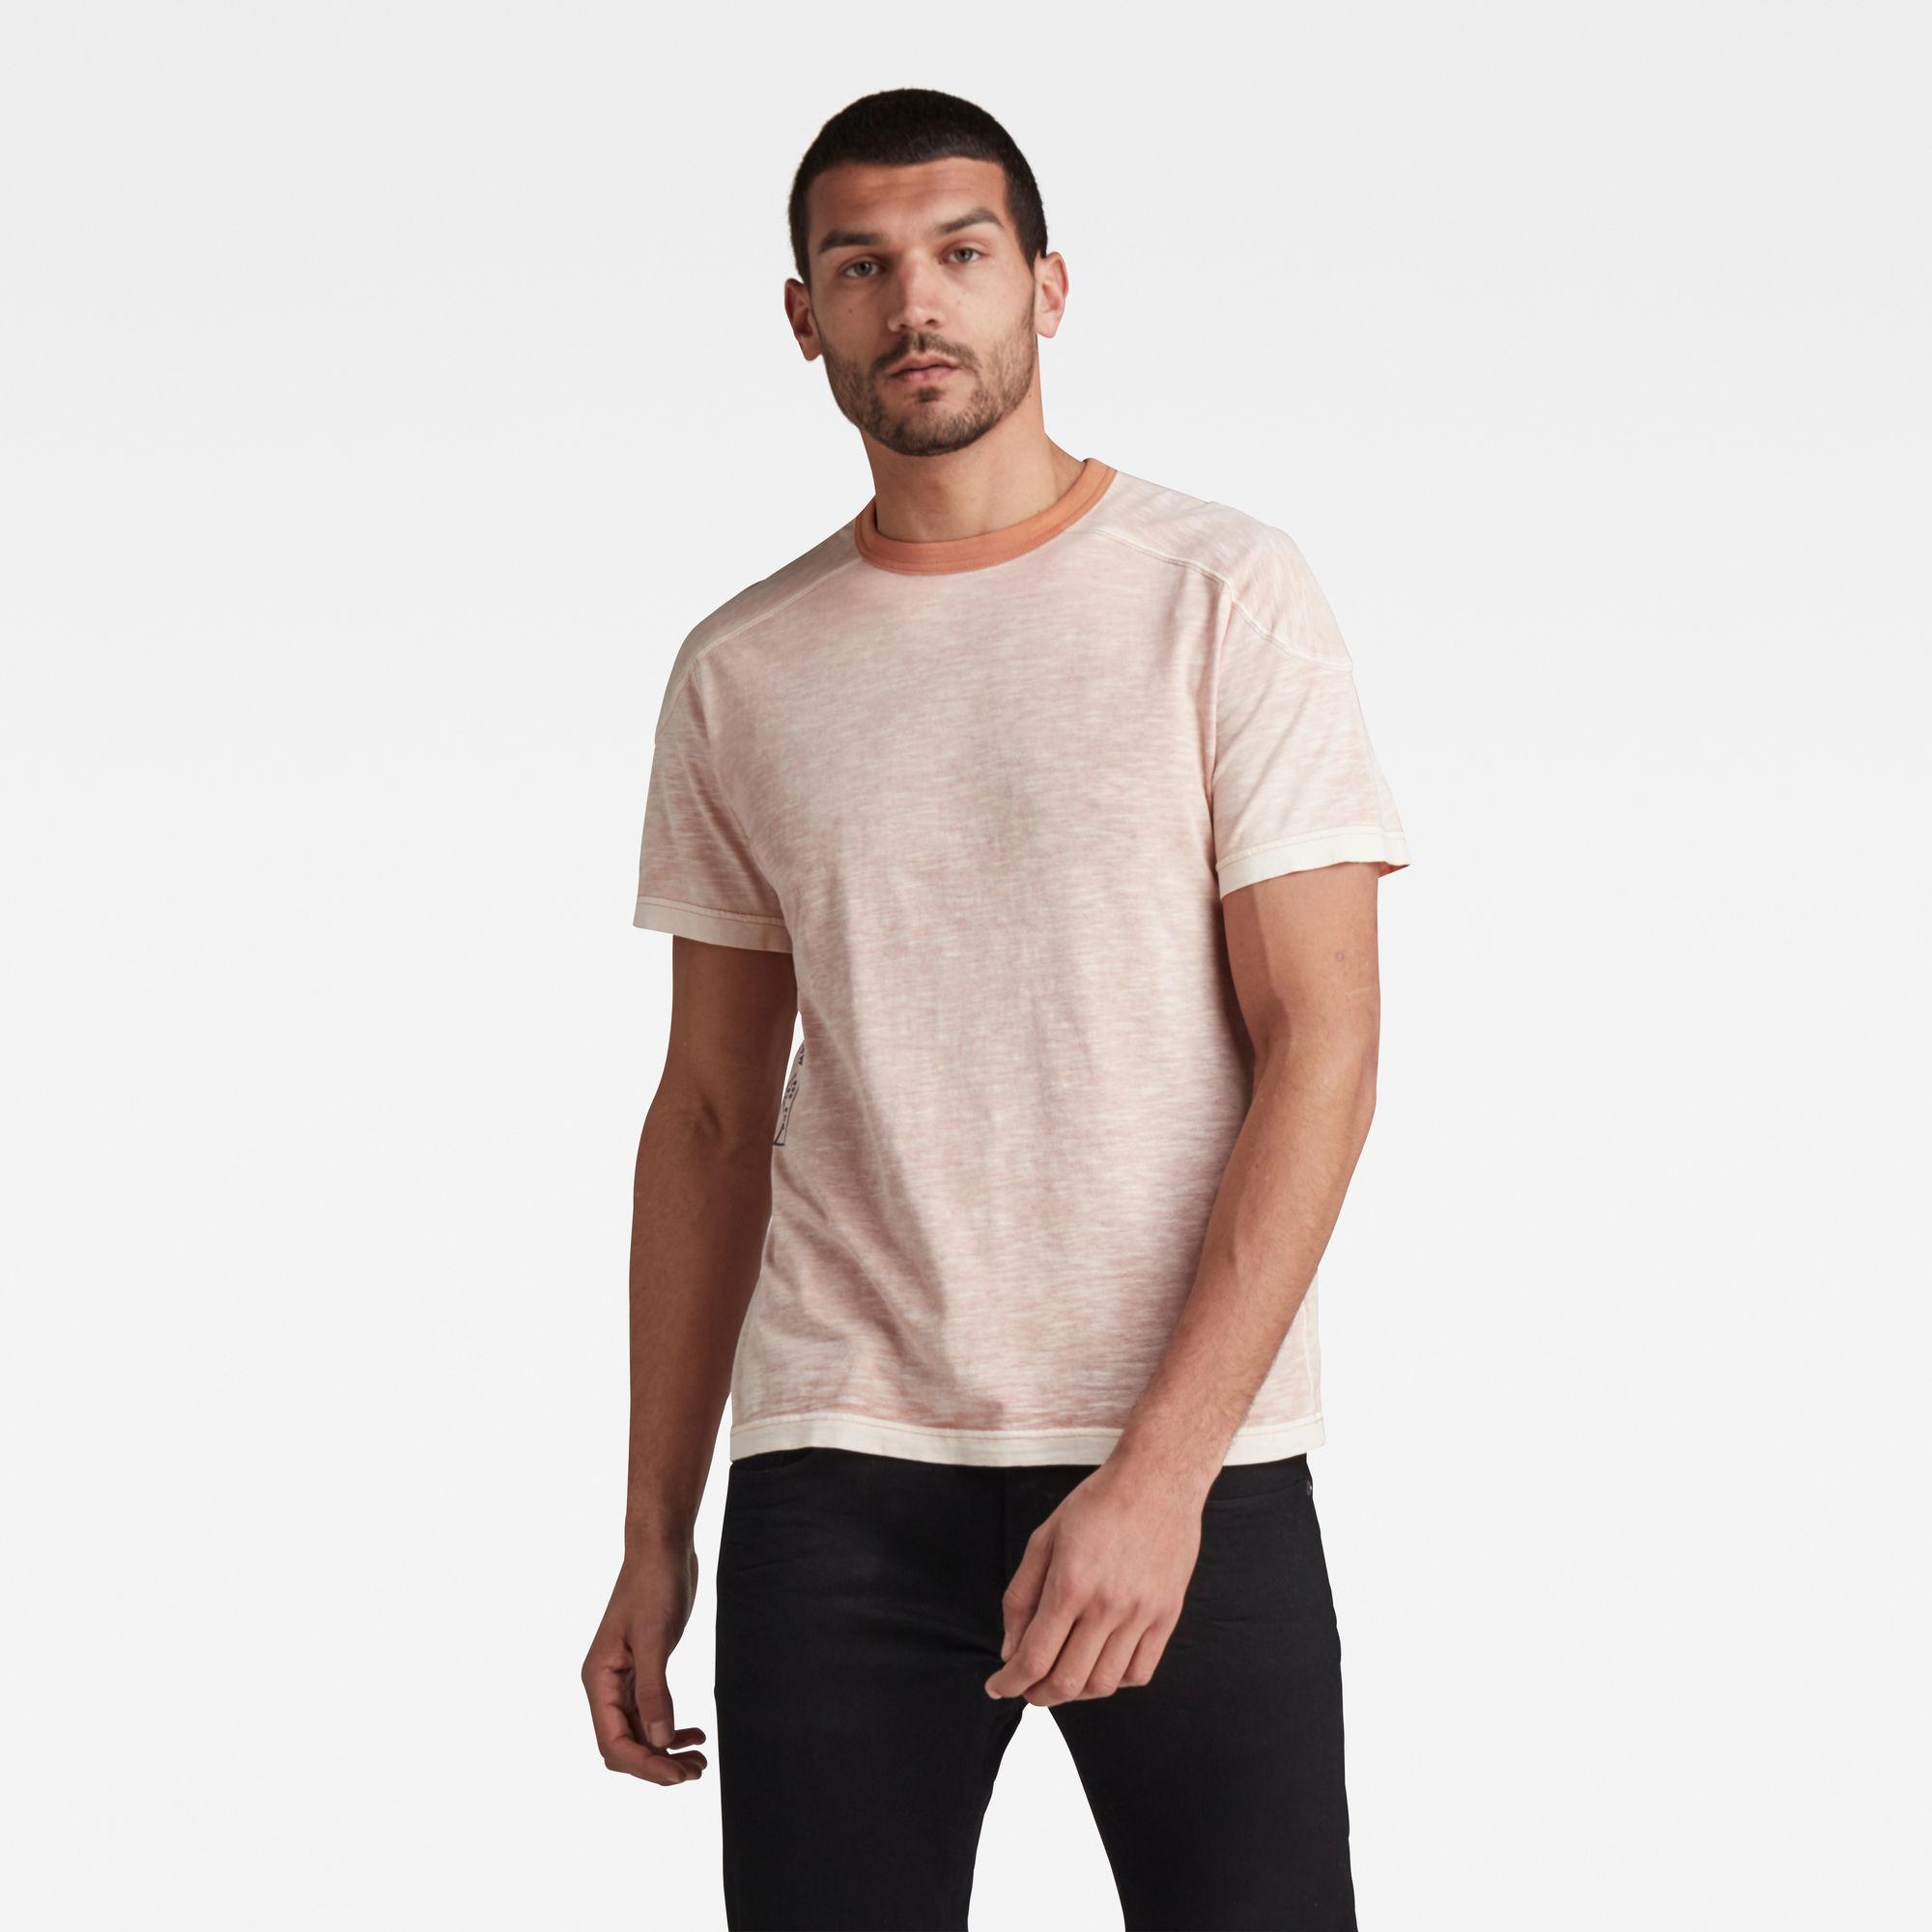 G-Star RAW Heren Rugby Spray Loose T-Shirt Roze